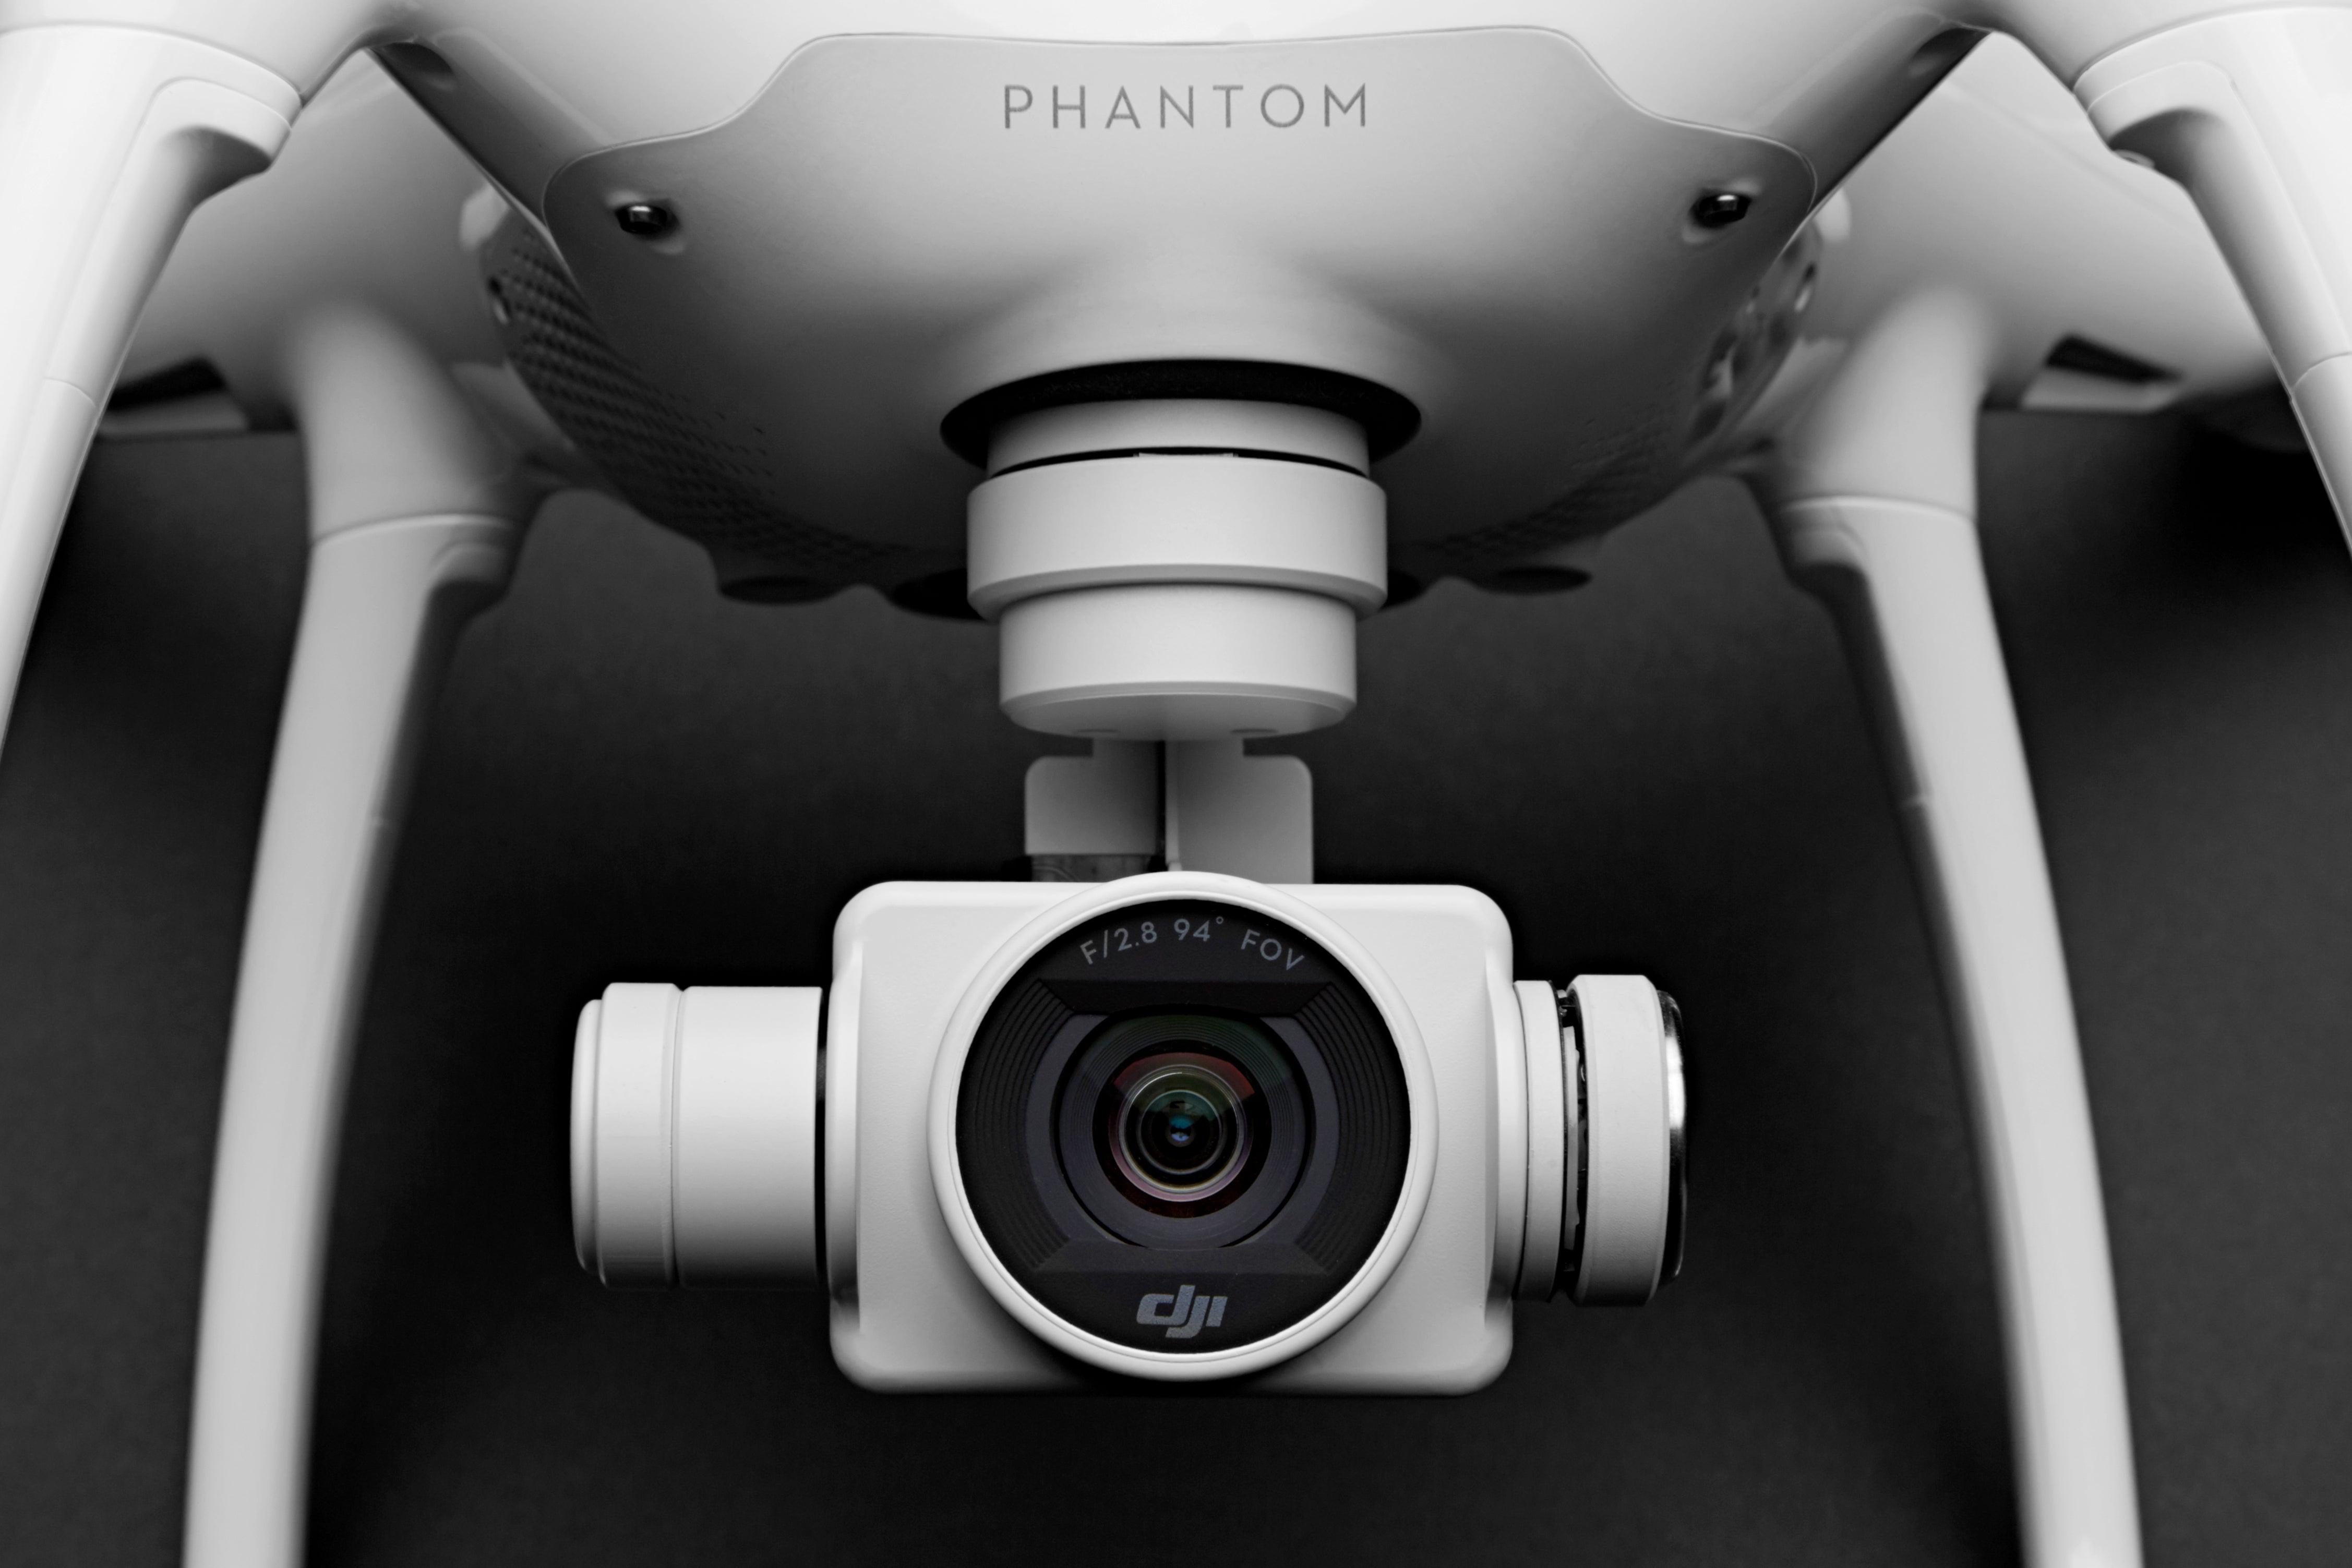 DJI's Phantom 4 Is Blazingly Fast and (Almost) Crash-Proof